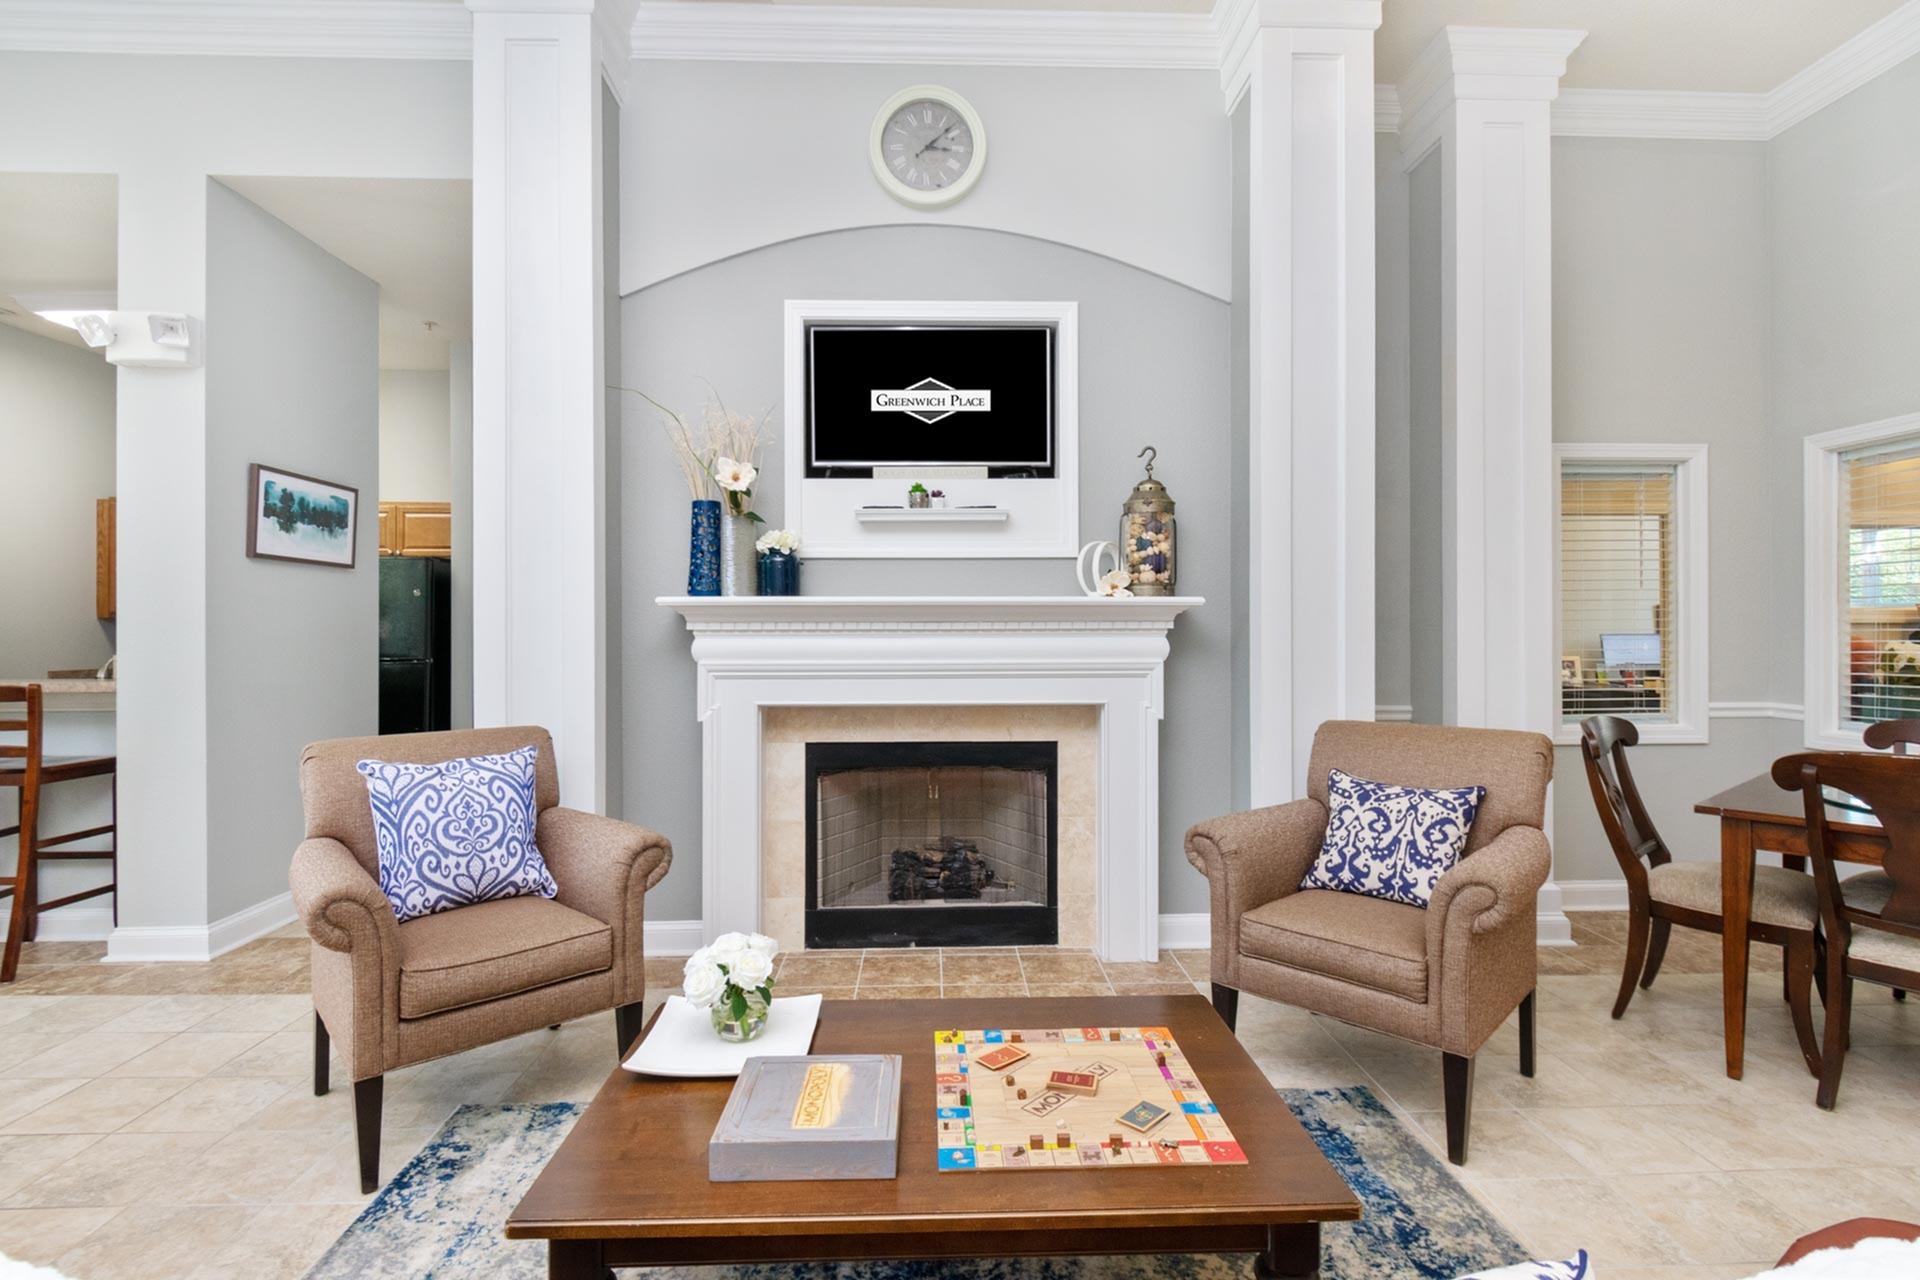 Elegant Resident Club House | West Warwick RI 1 Apartment Homes |